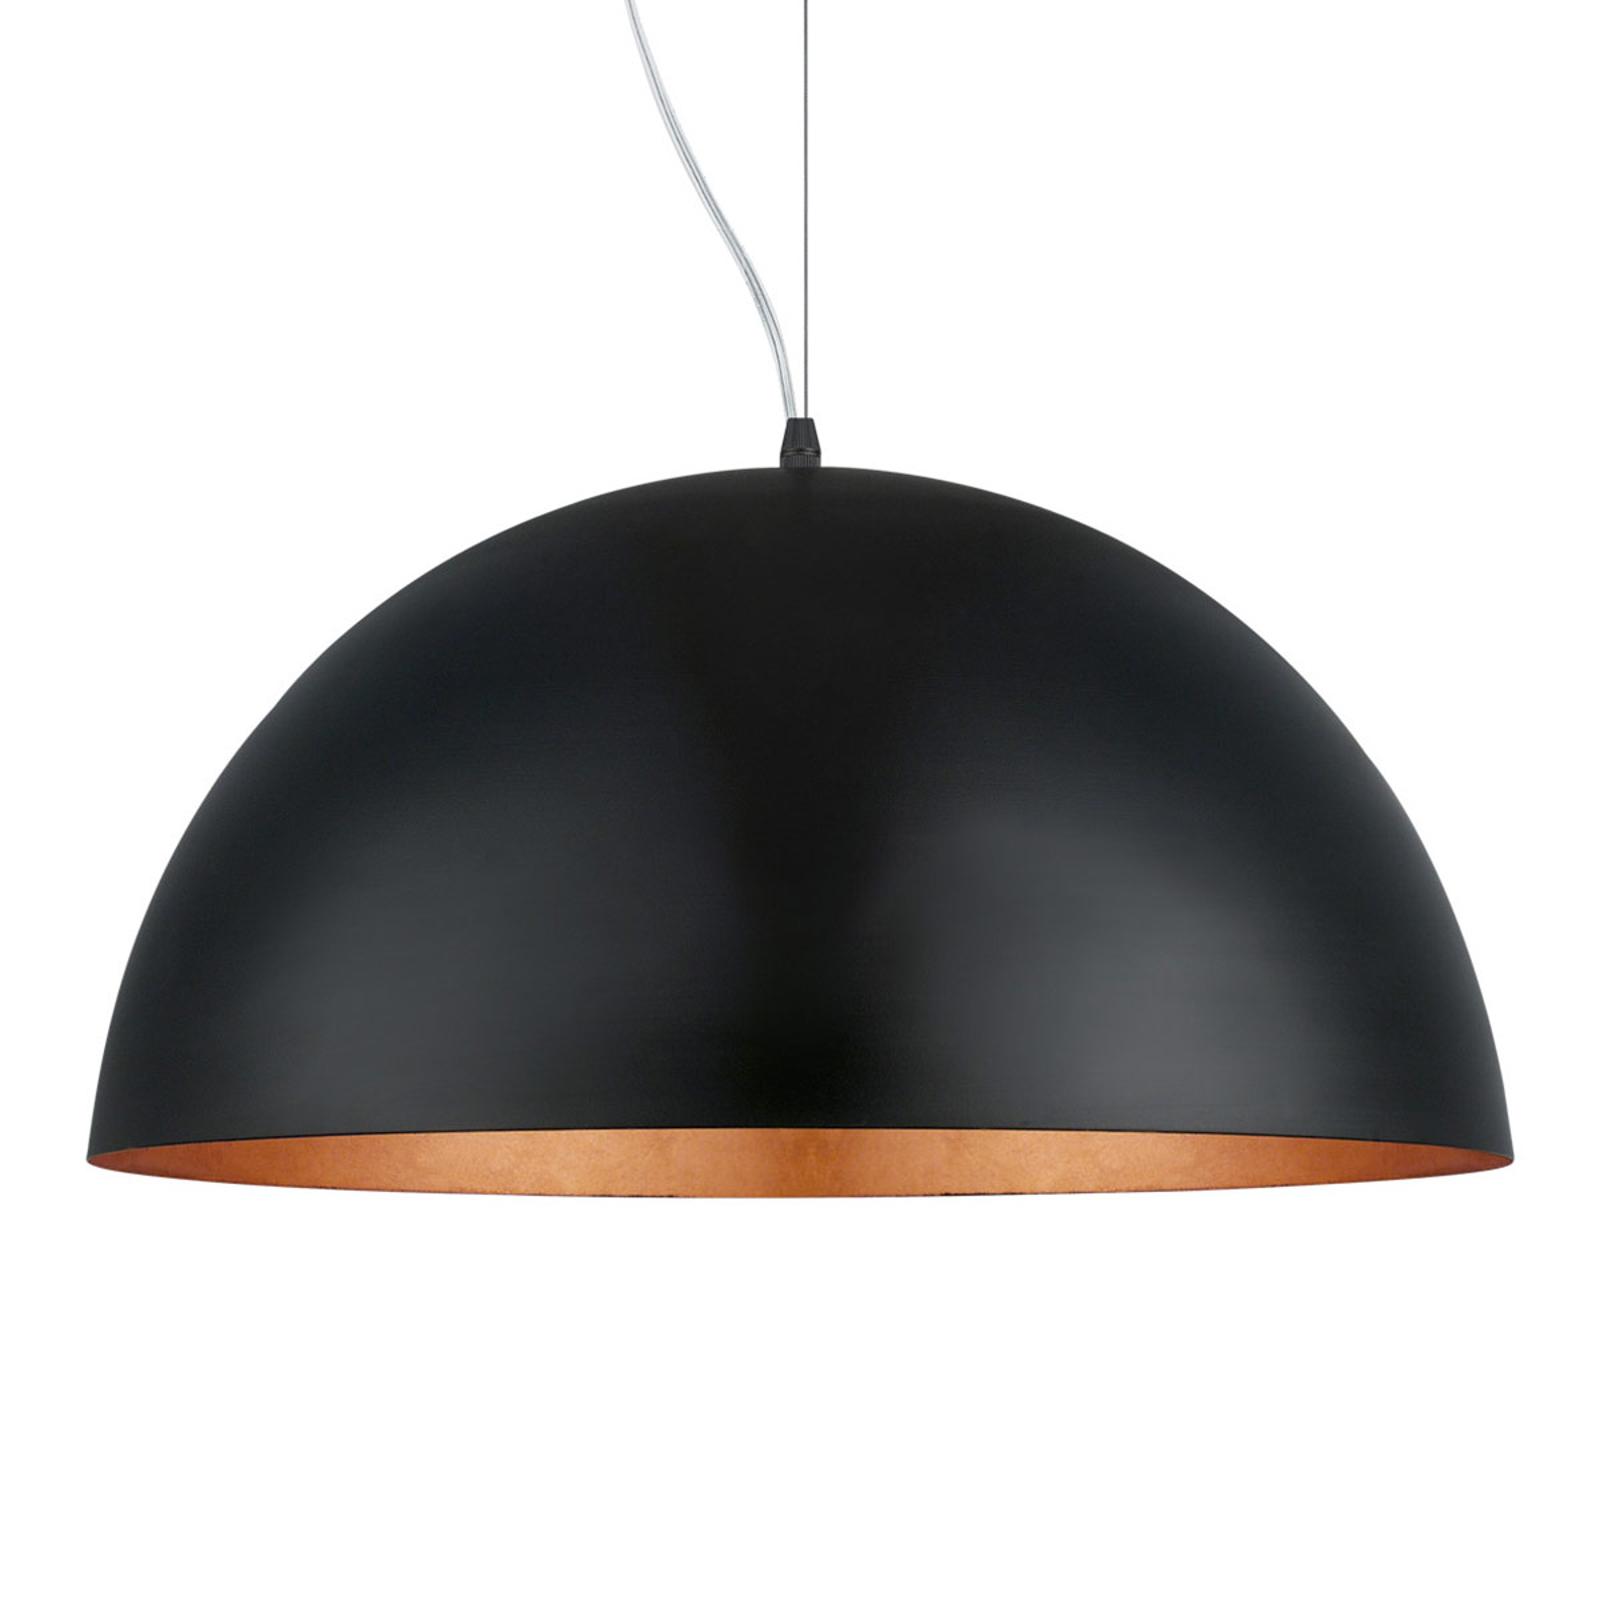 Image of: Gaetano 1 Hanging Light Black Copper Lights Co Uk